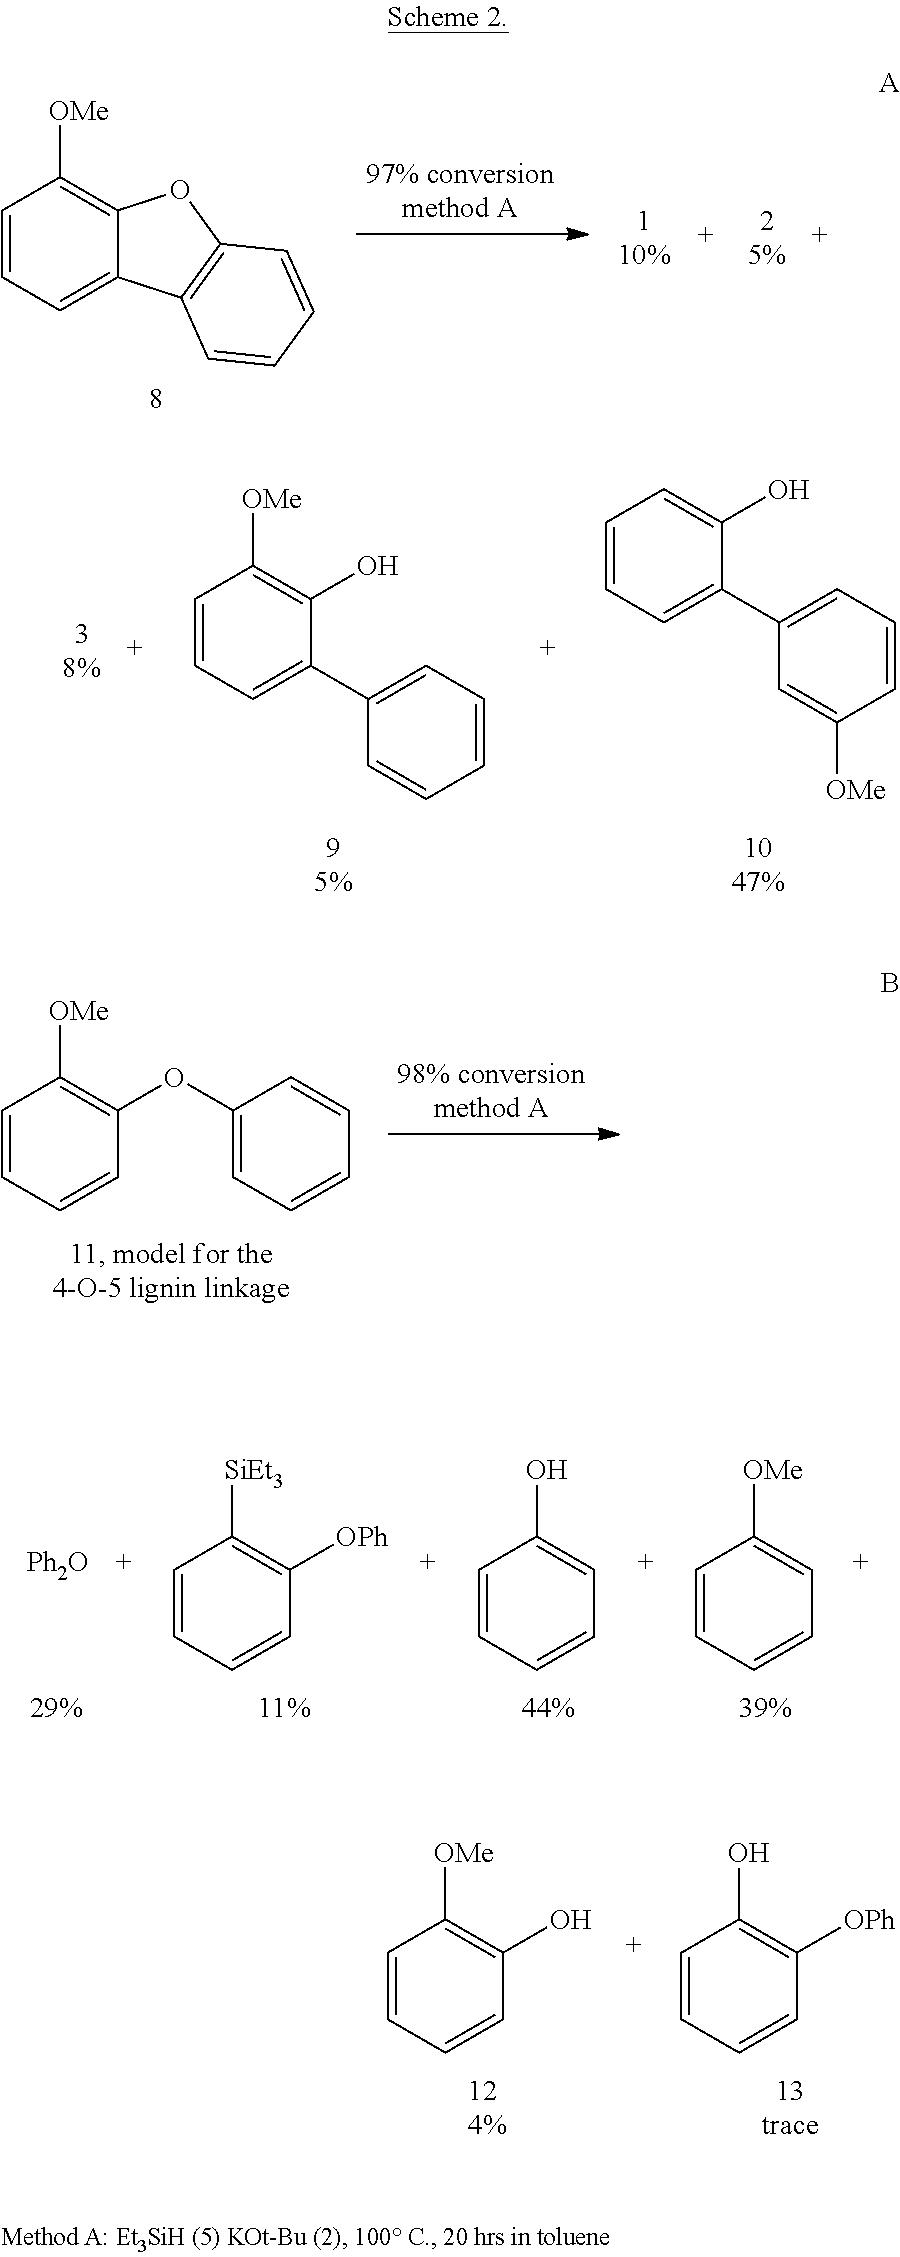 us20140094607a1 transition metal free silylation of aromatic New OSI Model figure us20140094607a1 20140403 c00021